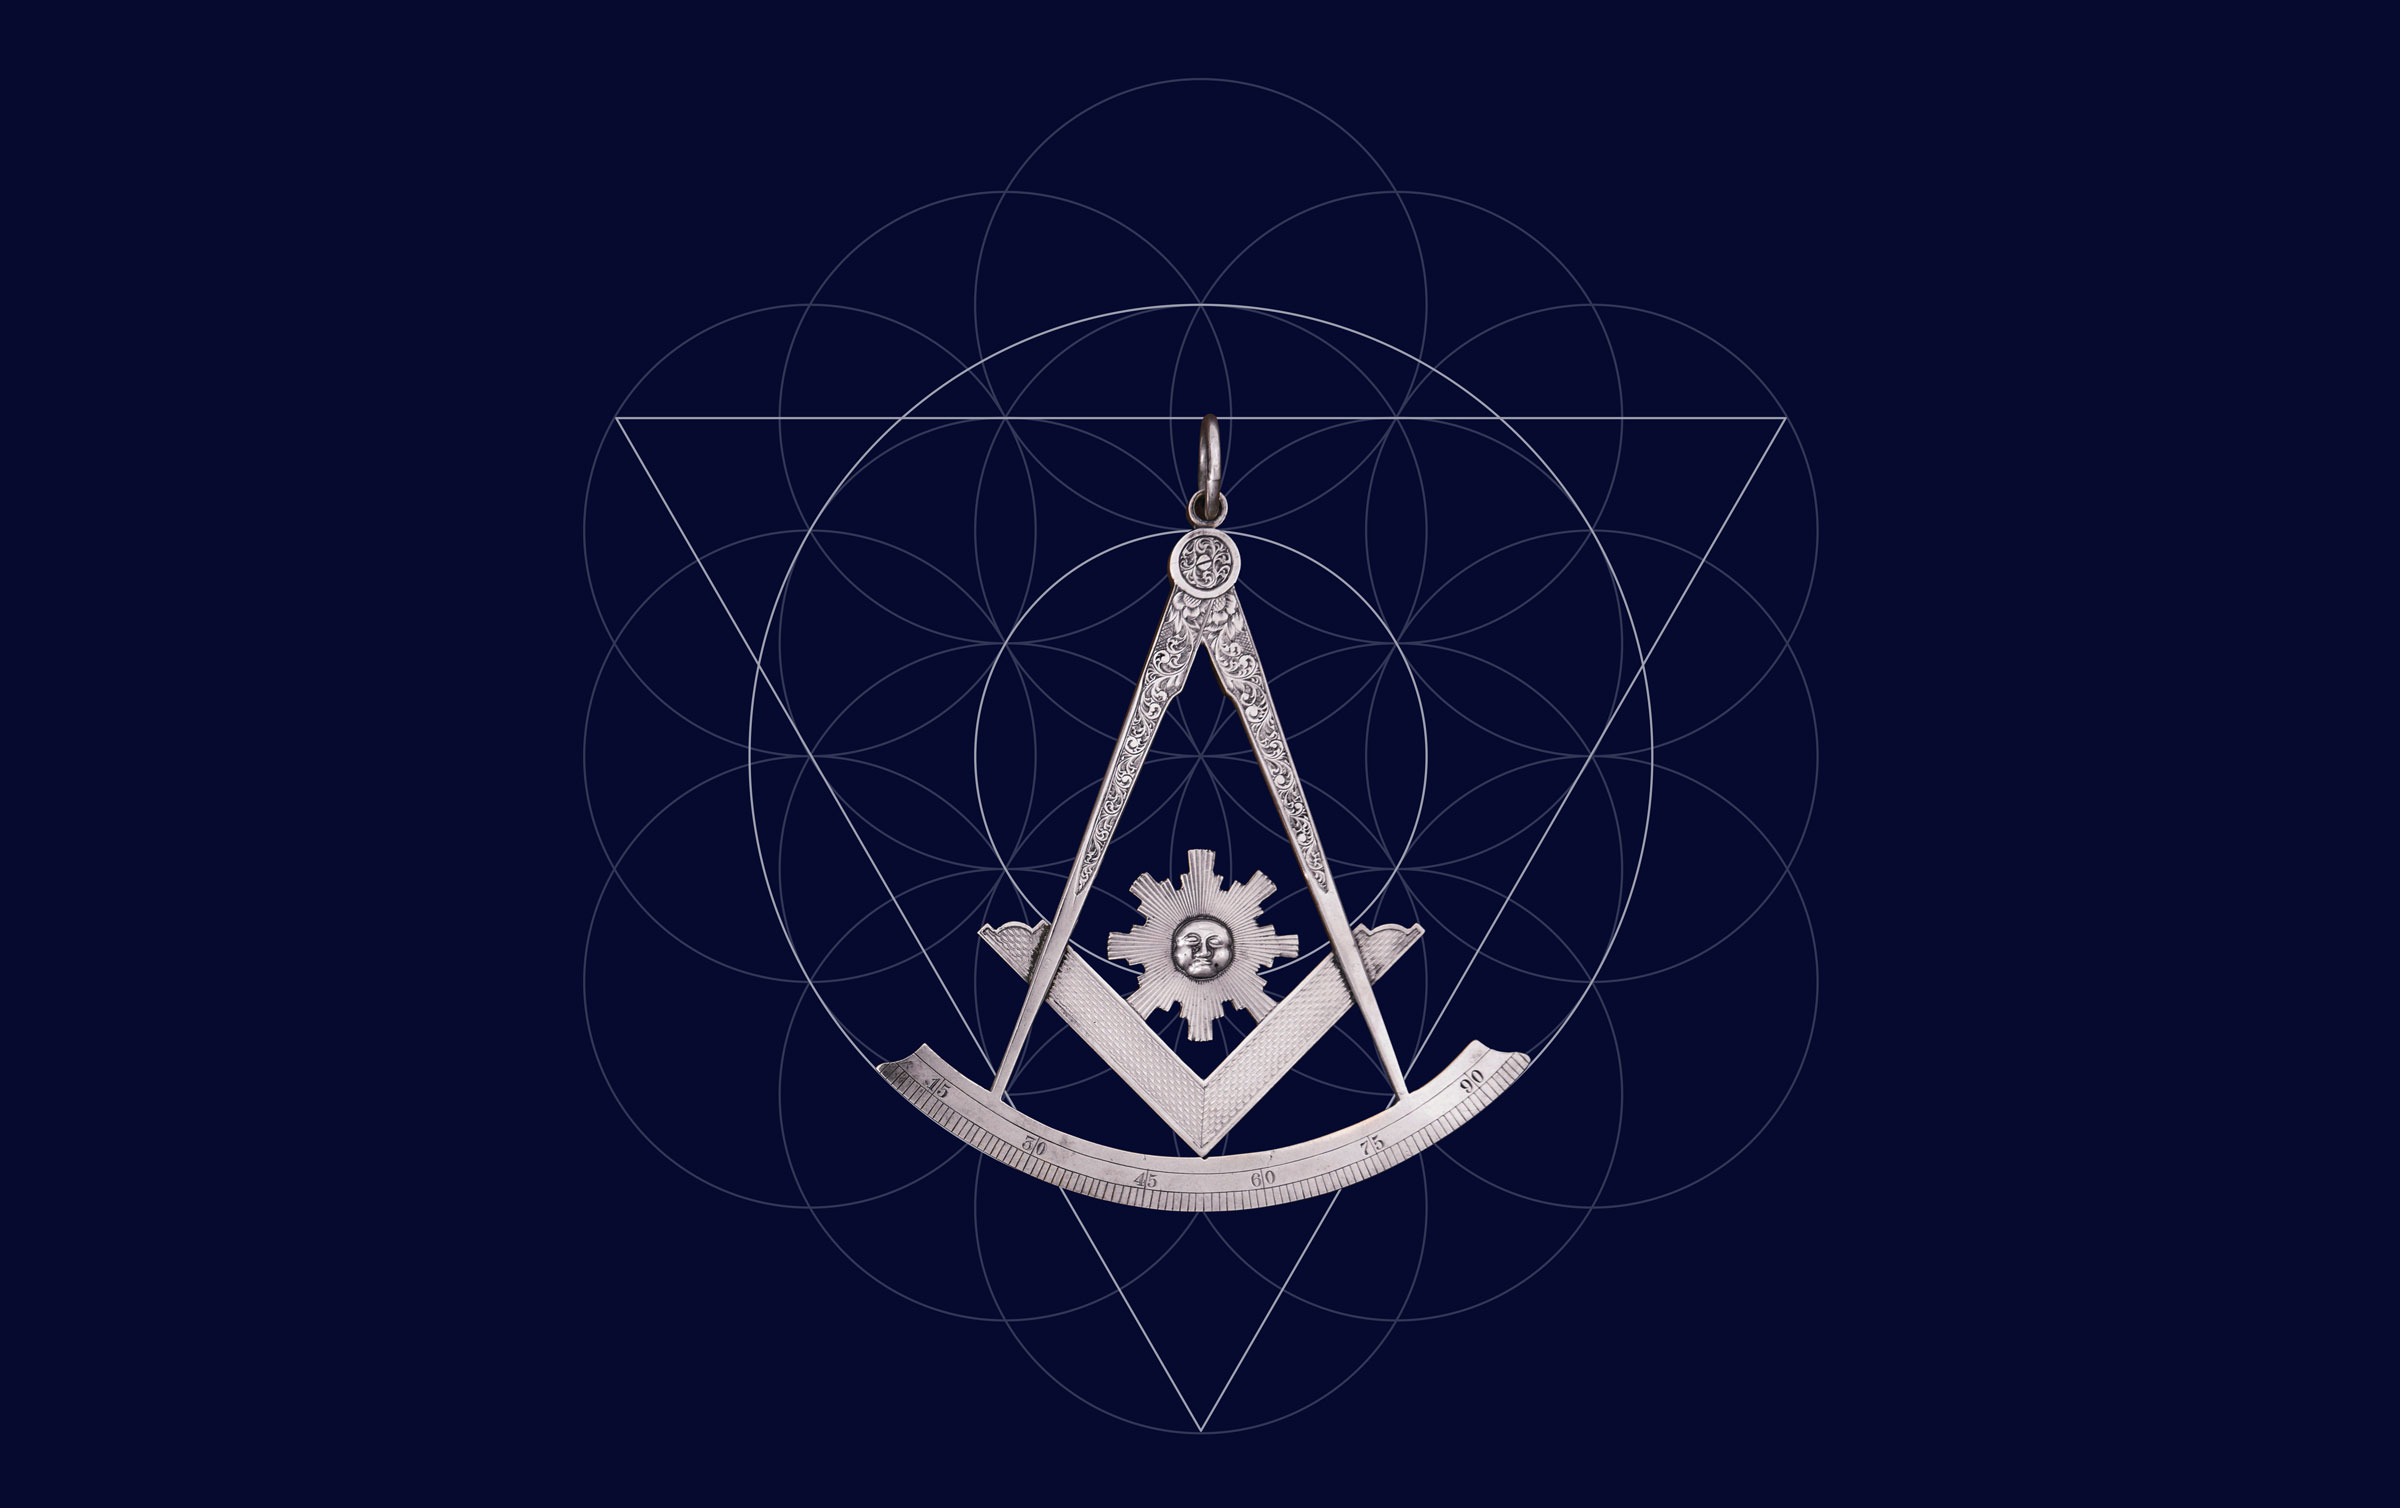 Musueum-of_freemasonry-object-graphic-1